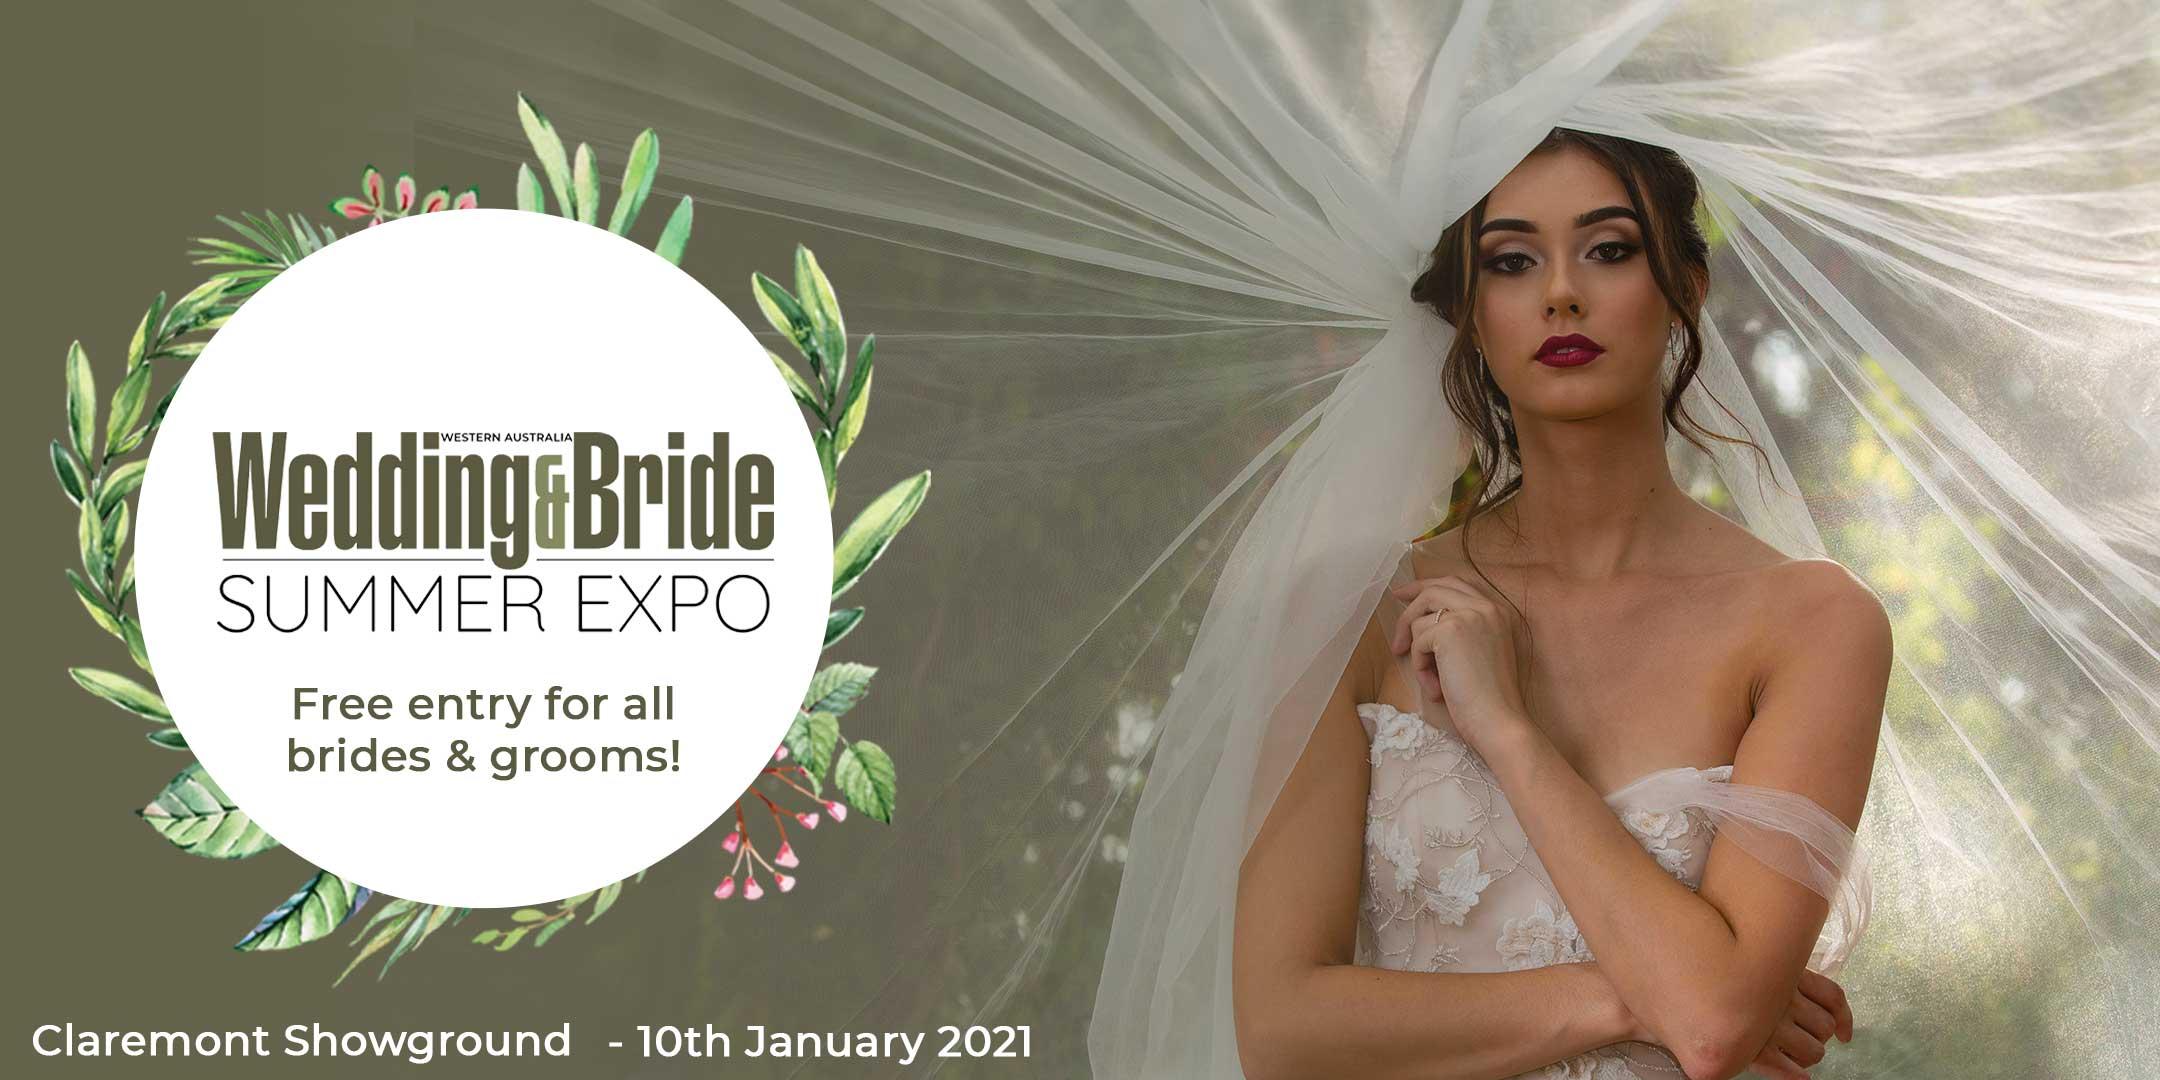 Melbourne Bridal Expos - Wedding and Bride Wedding Expo